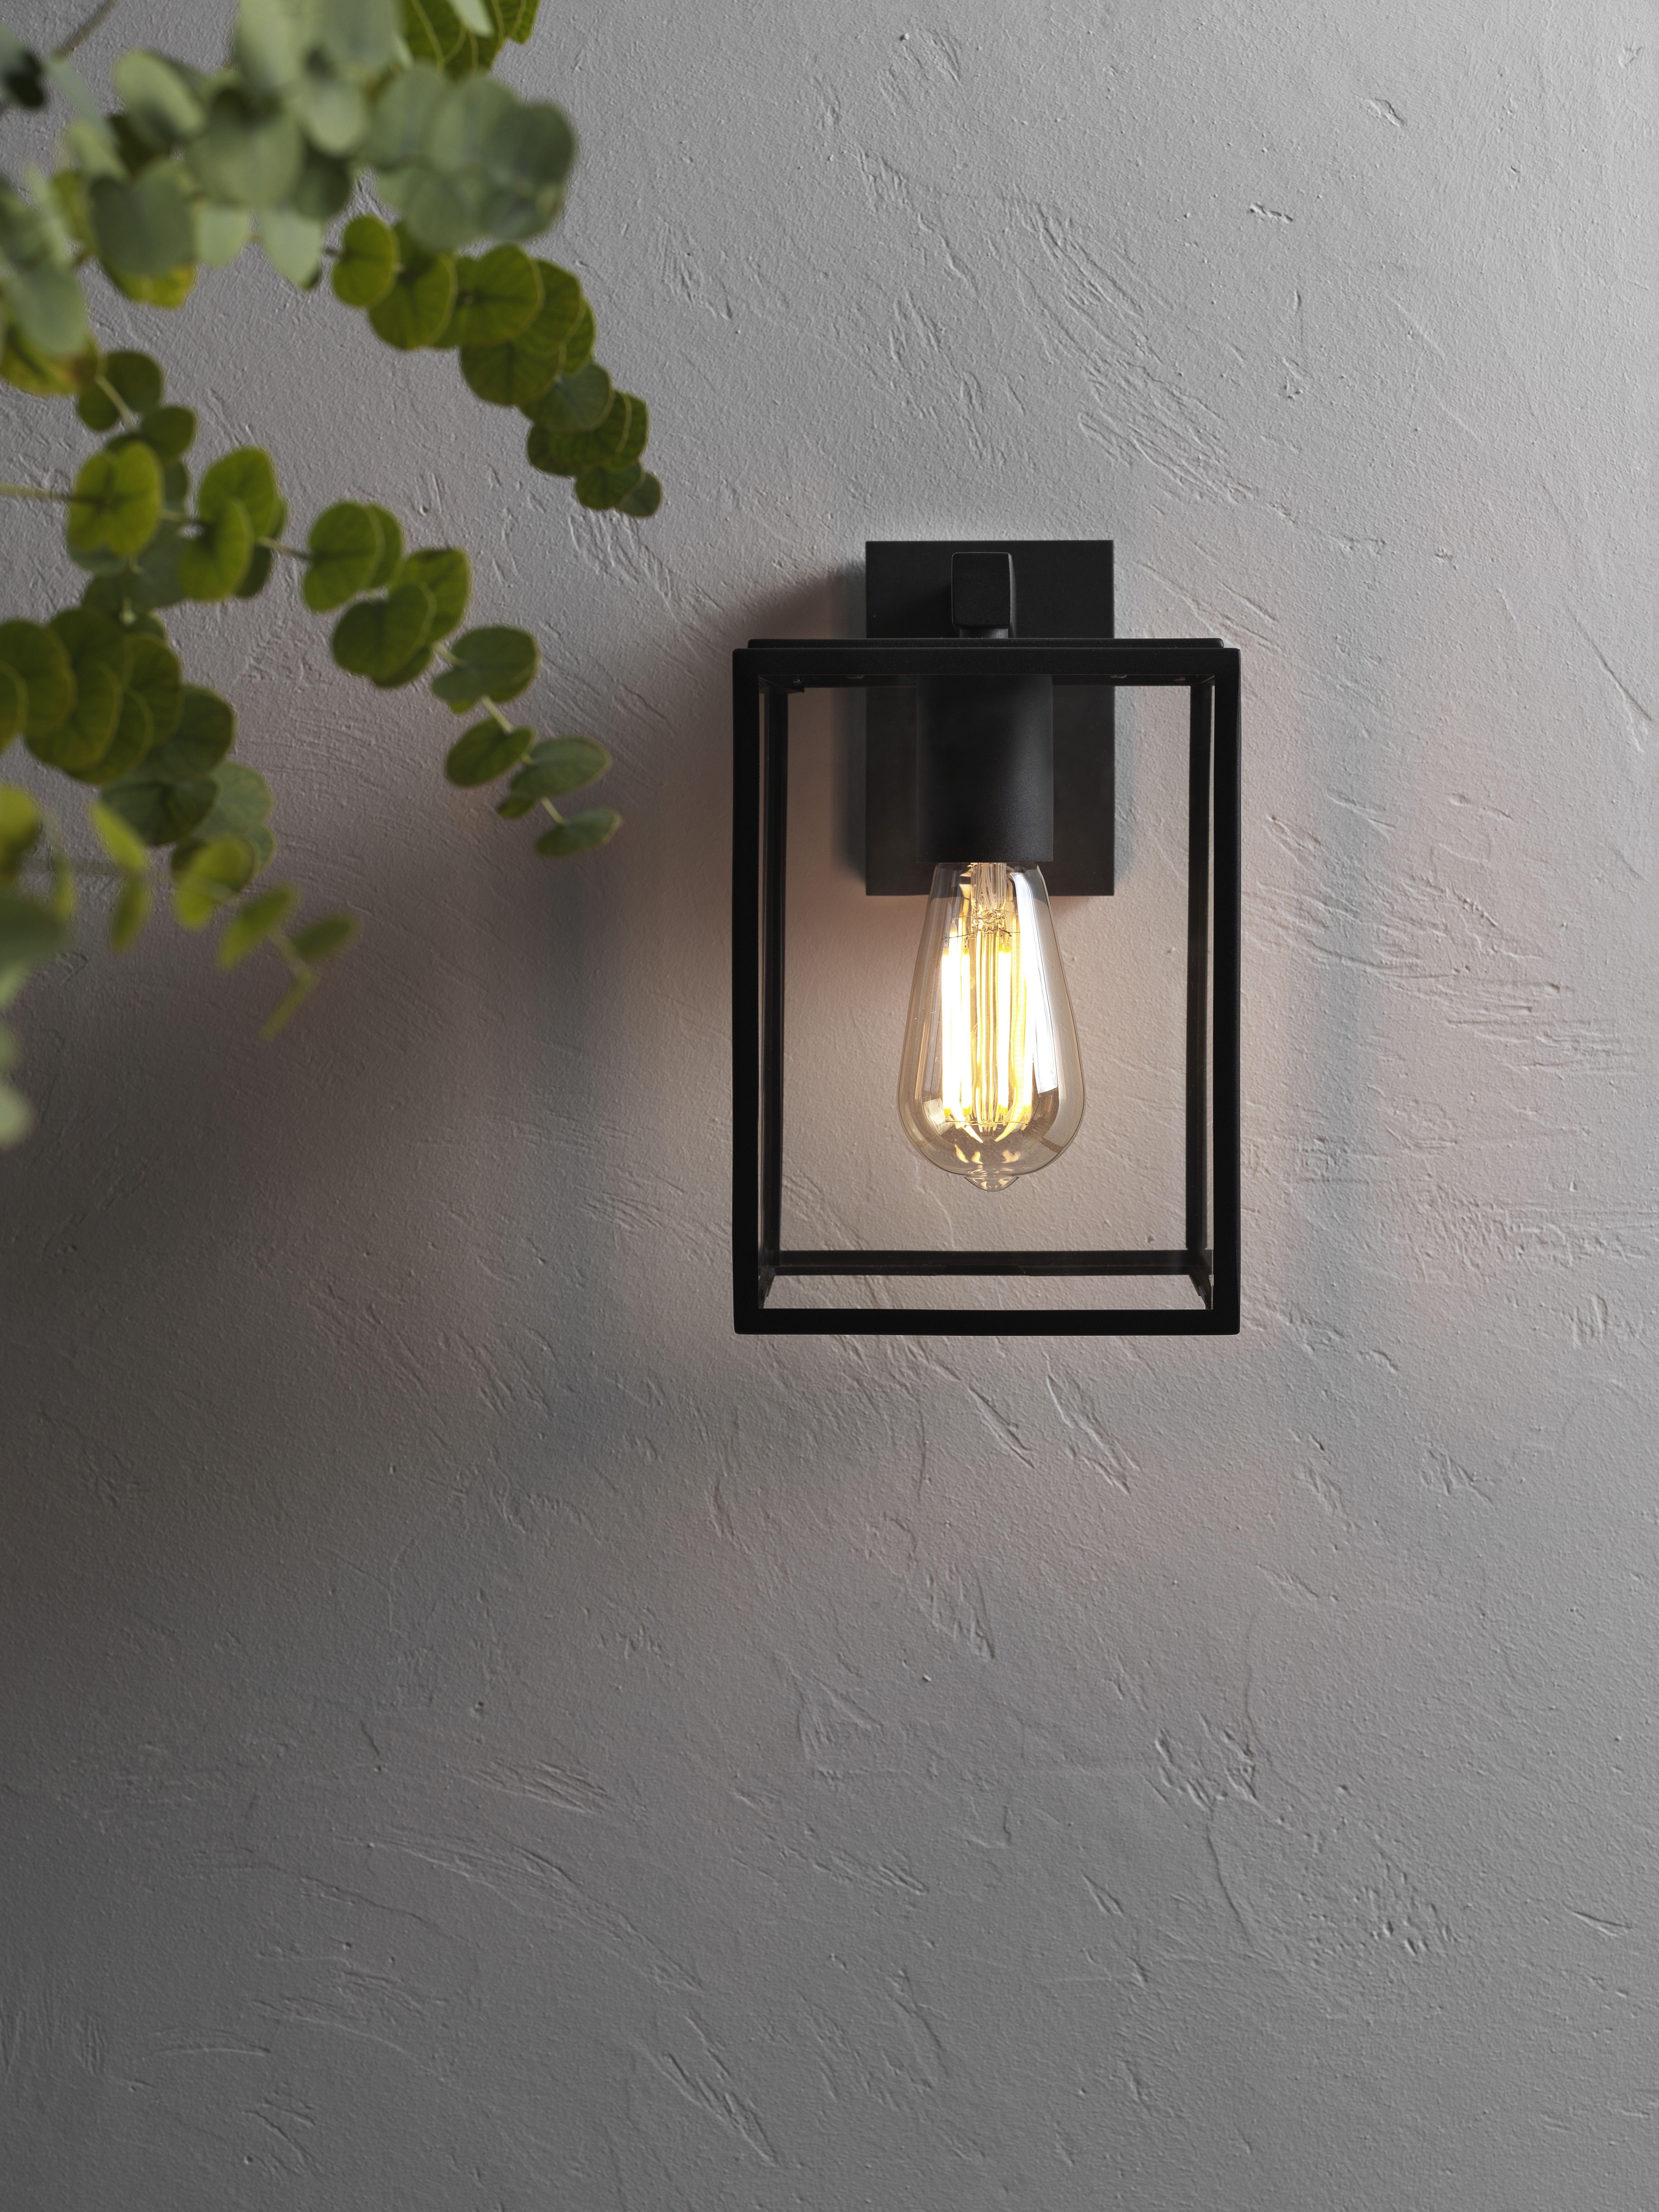 Astrolighting Lighting Oswietlenie Astrolighting Interiors